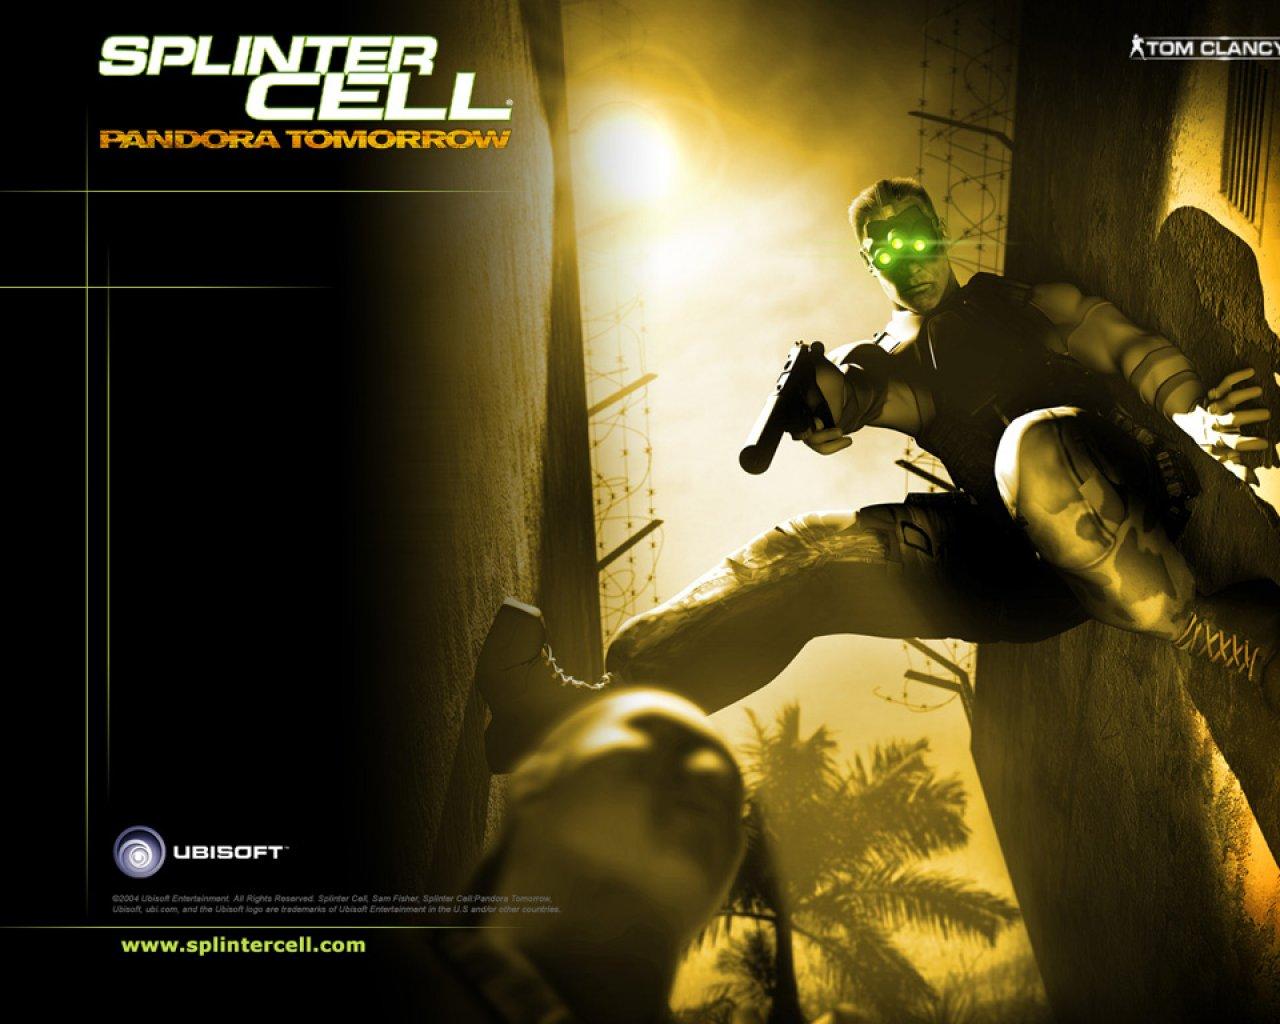 Splinter Cell Wallpapers - Download Splinter Cell ...